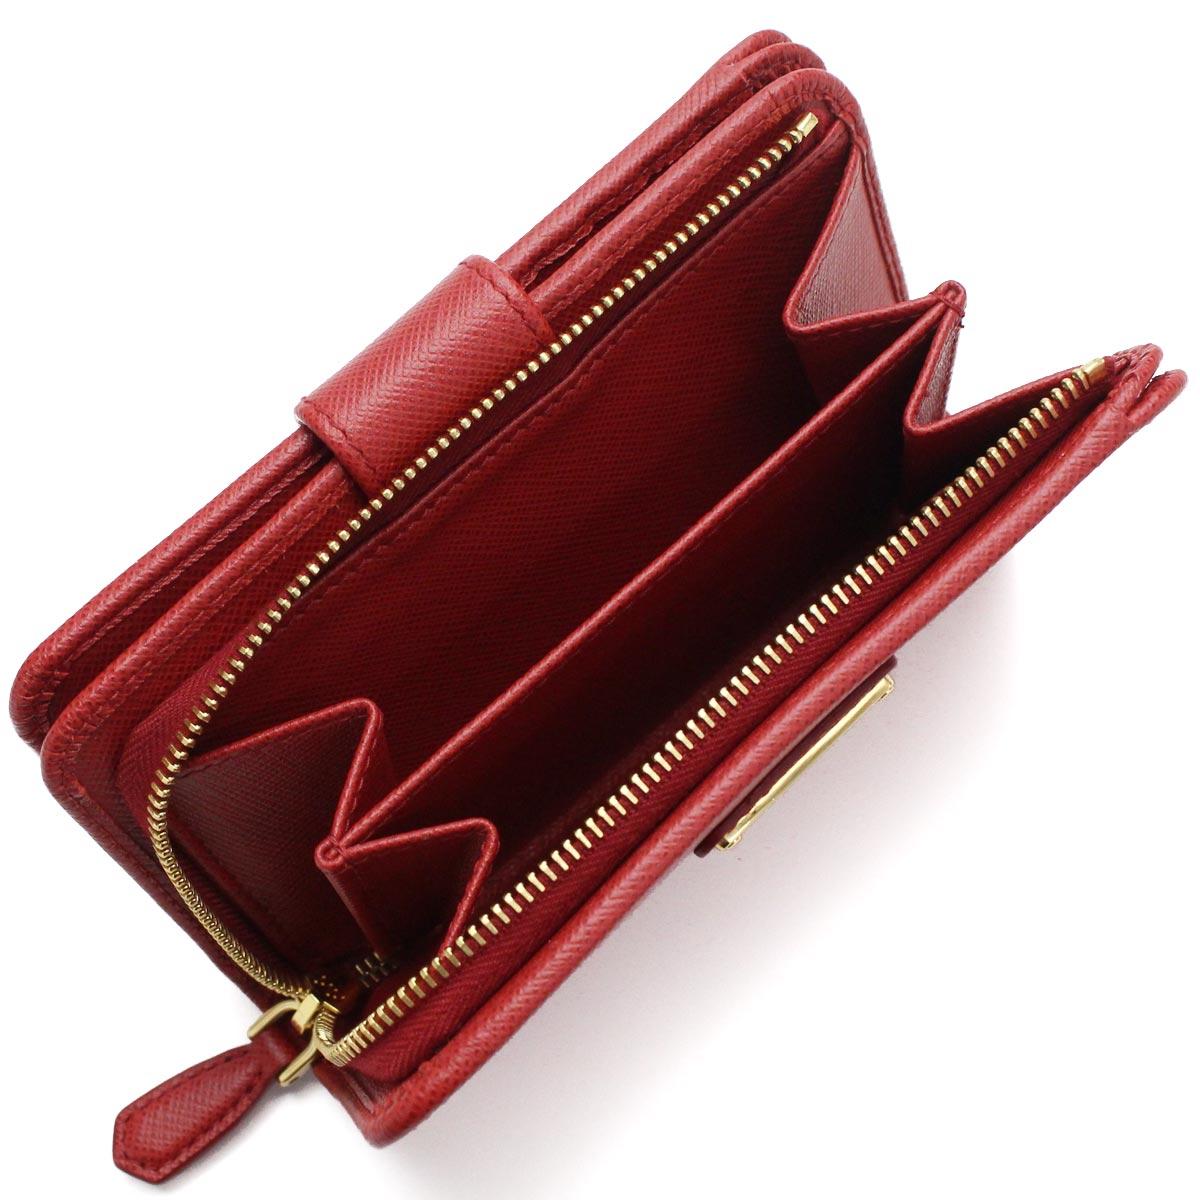 2184182610346 Bighit The total brand wholesale  Prada PRADA wallet folio compact ...